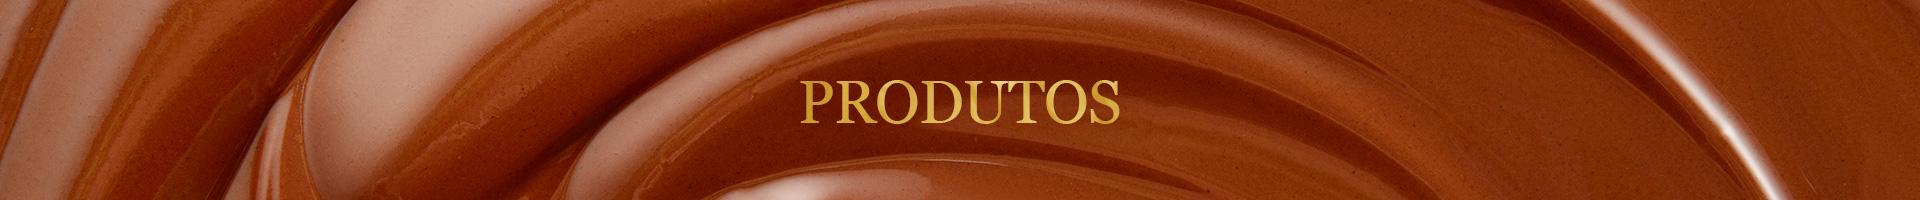 produtos chocolateria brasileira